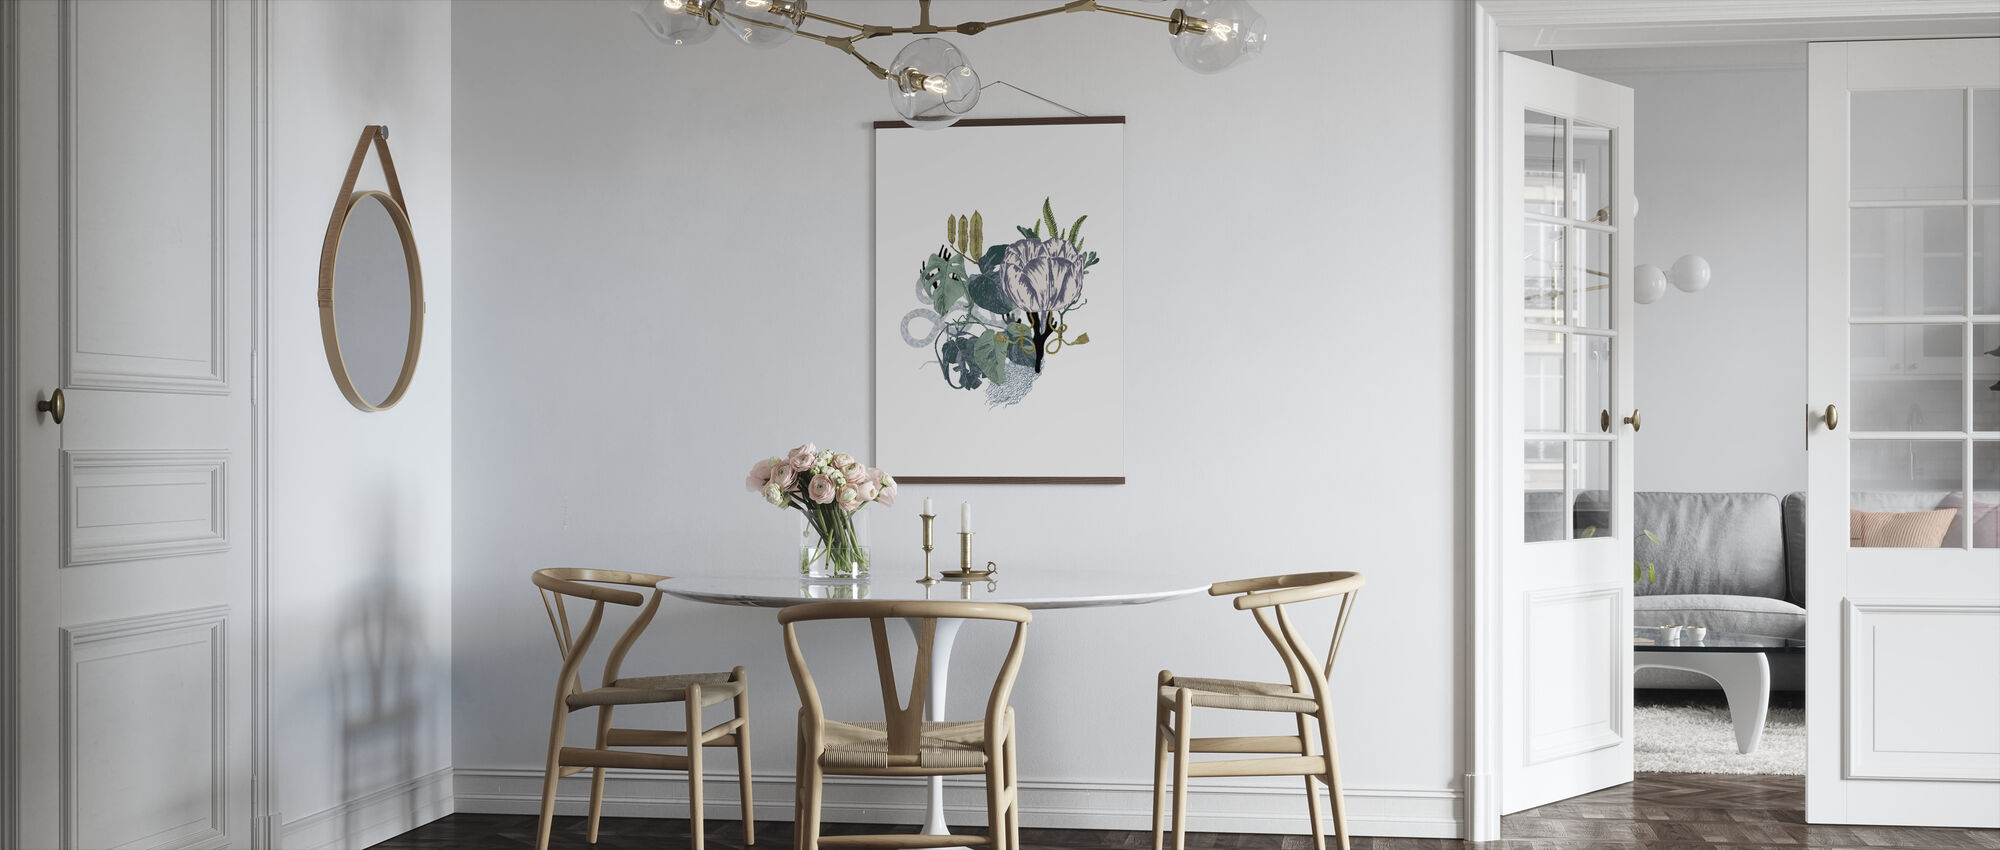 Blek tulpan - Poster - Kök